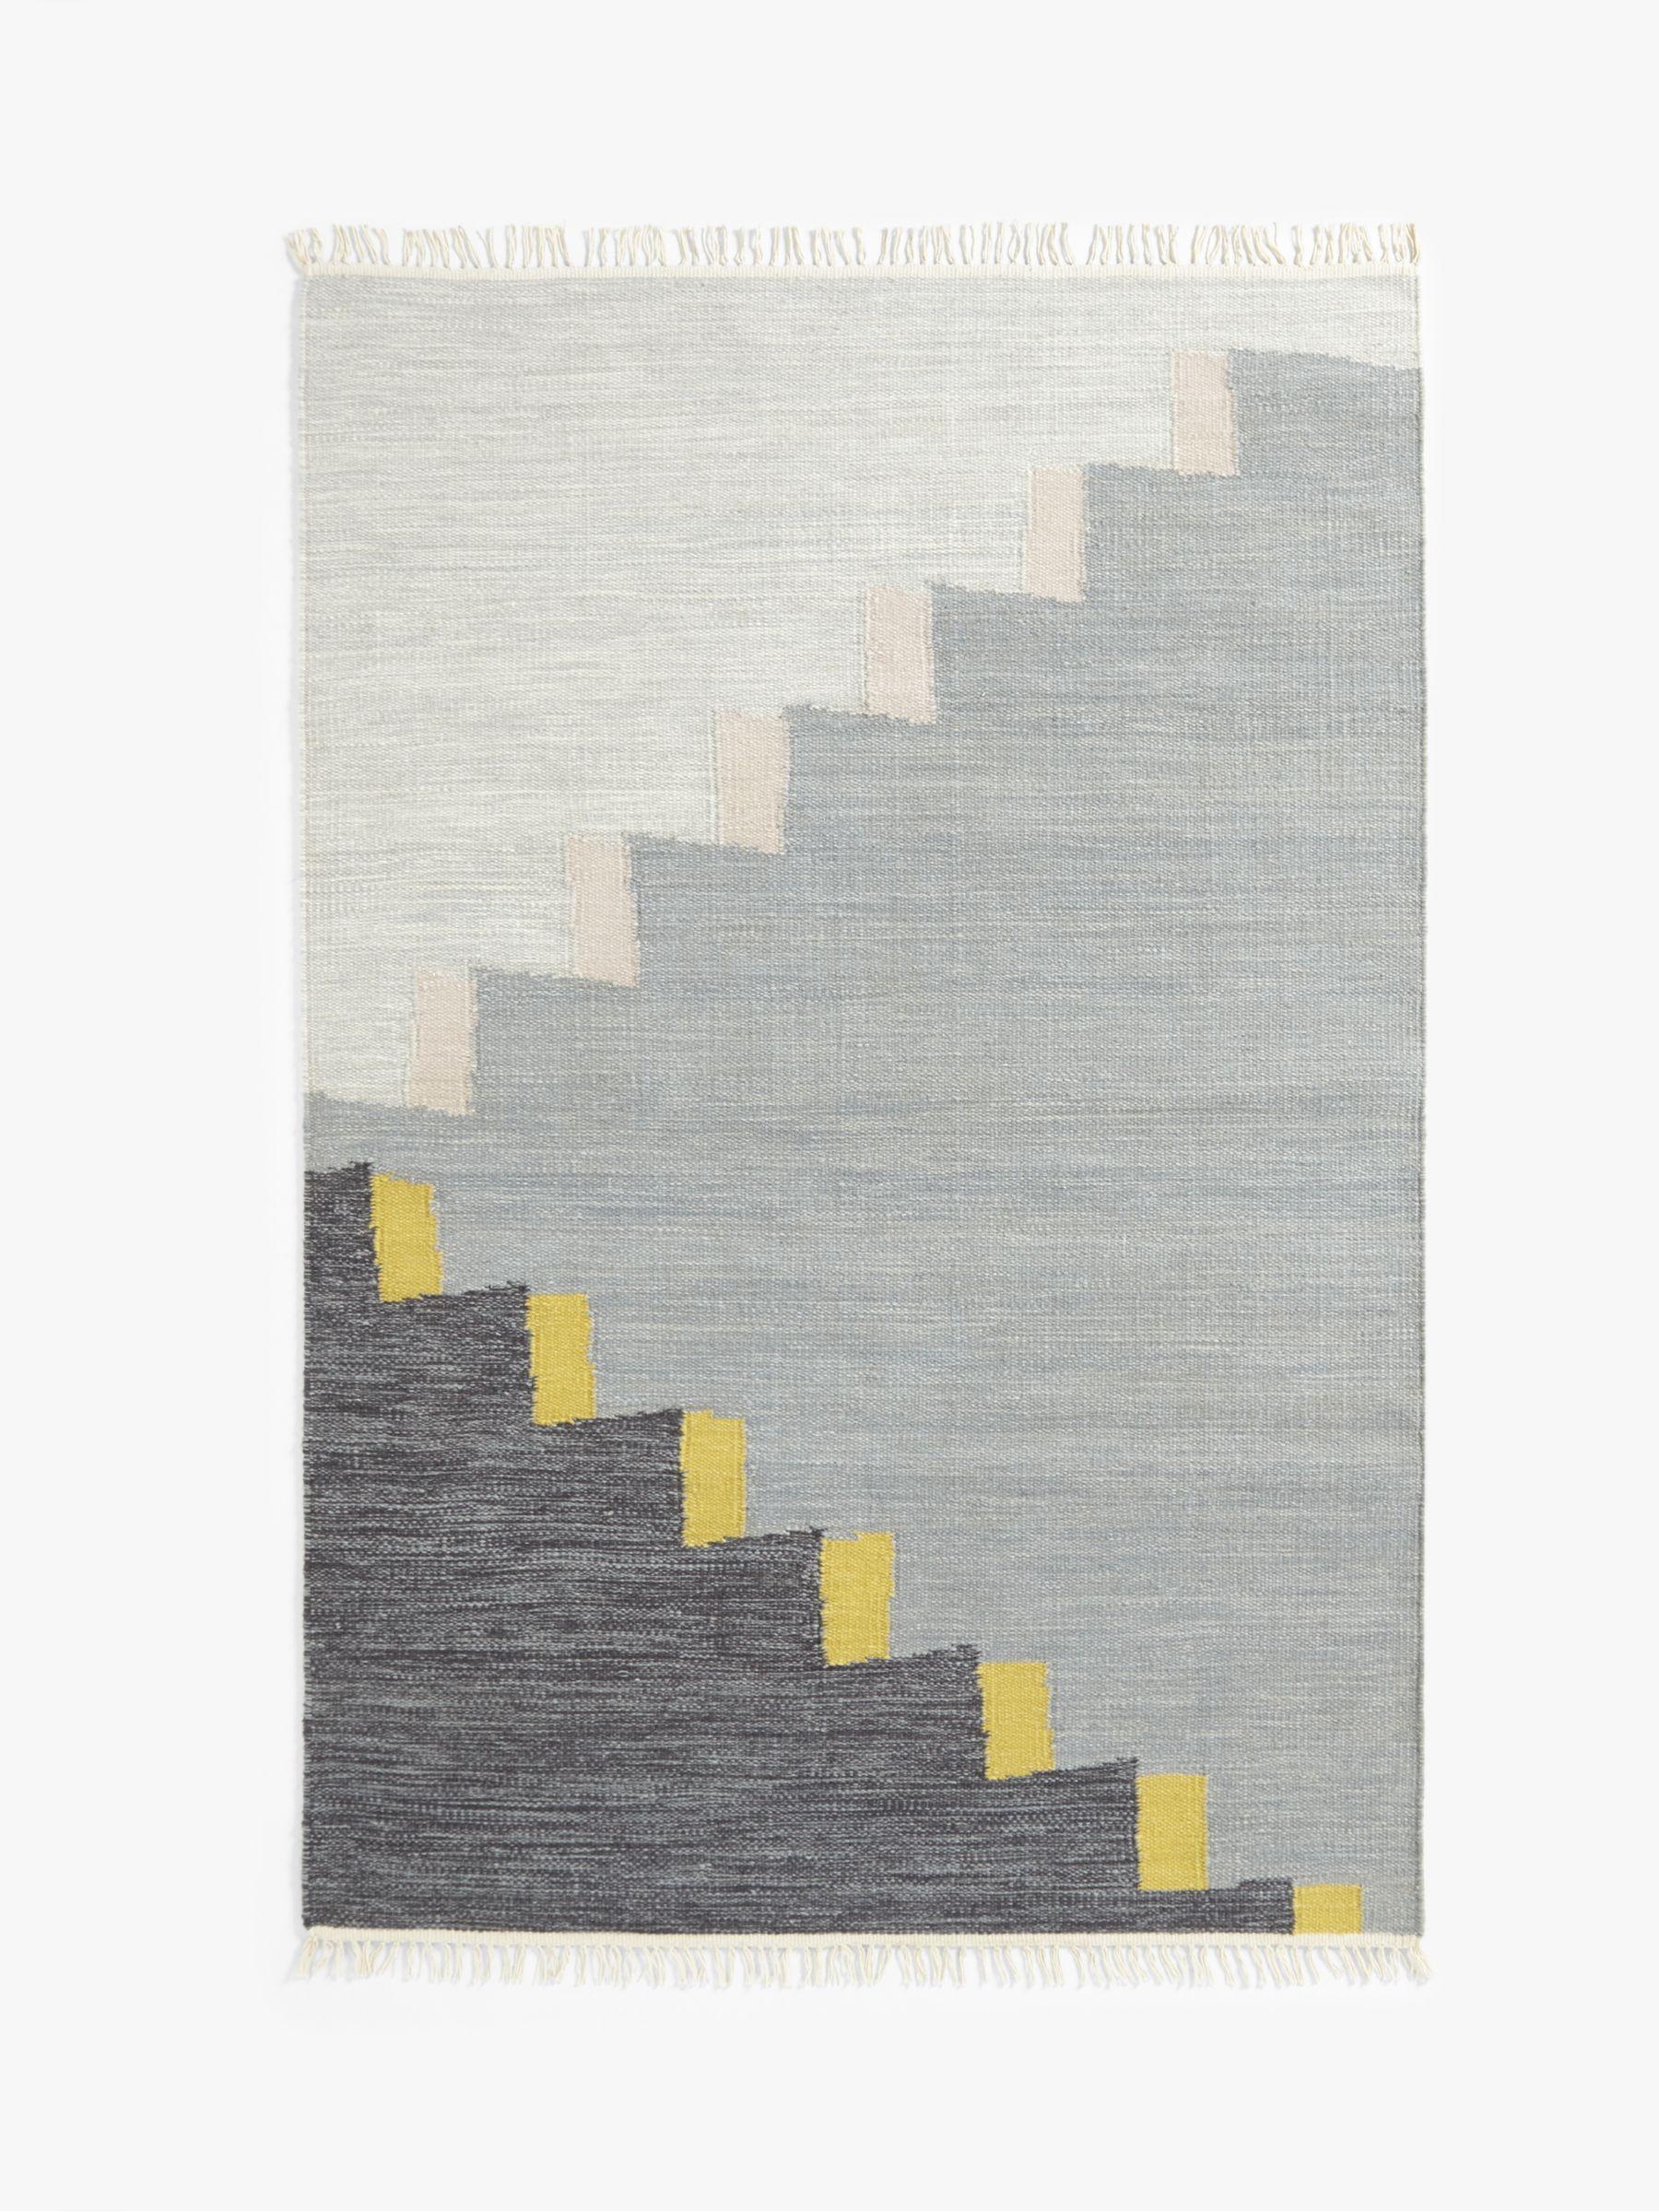 John Lewis Partners Hand Woven Ascent Flatweave Rug Grey